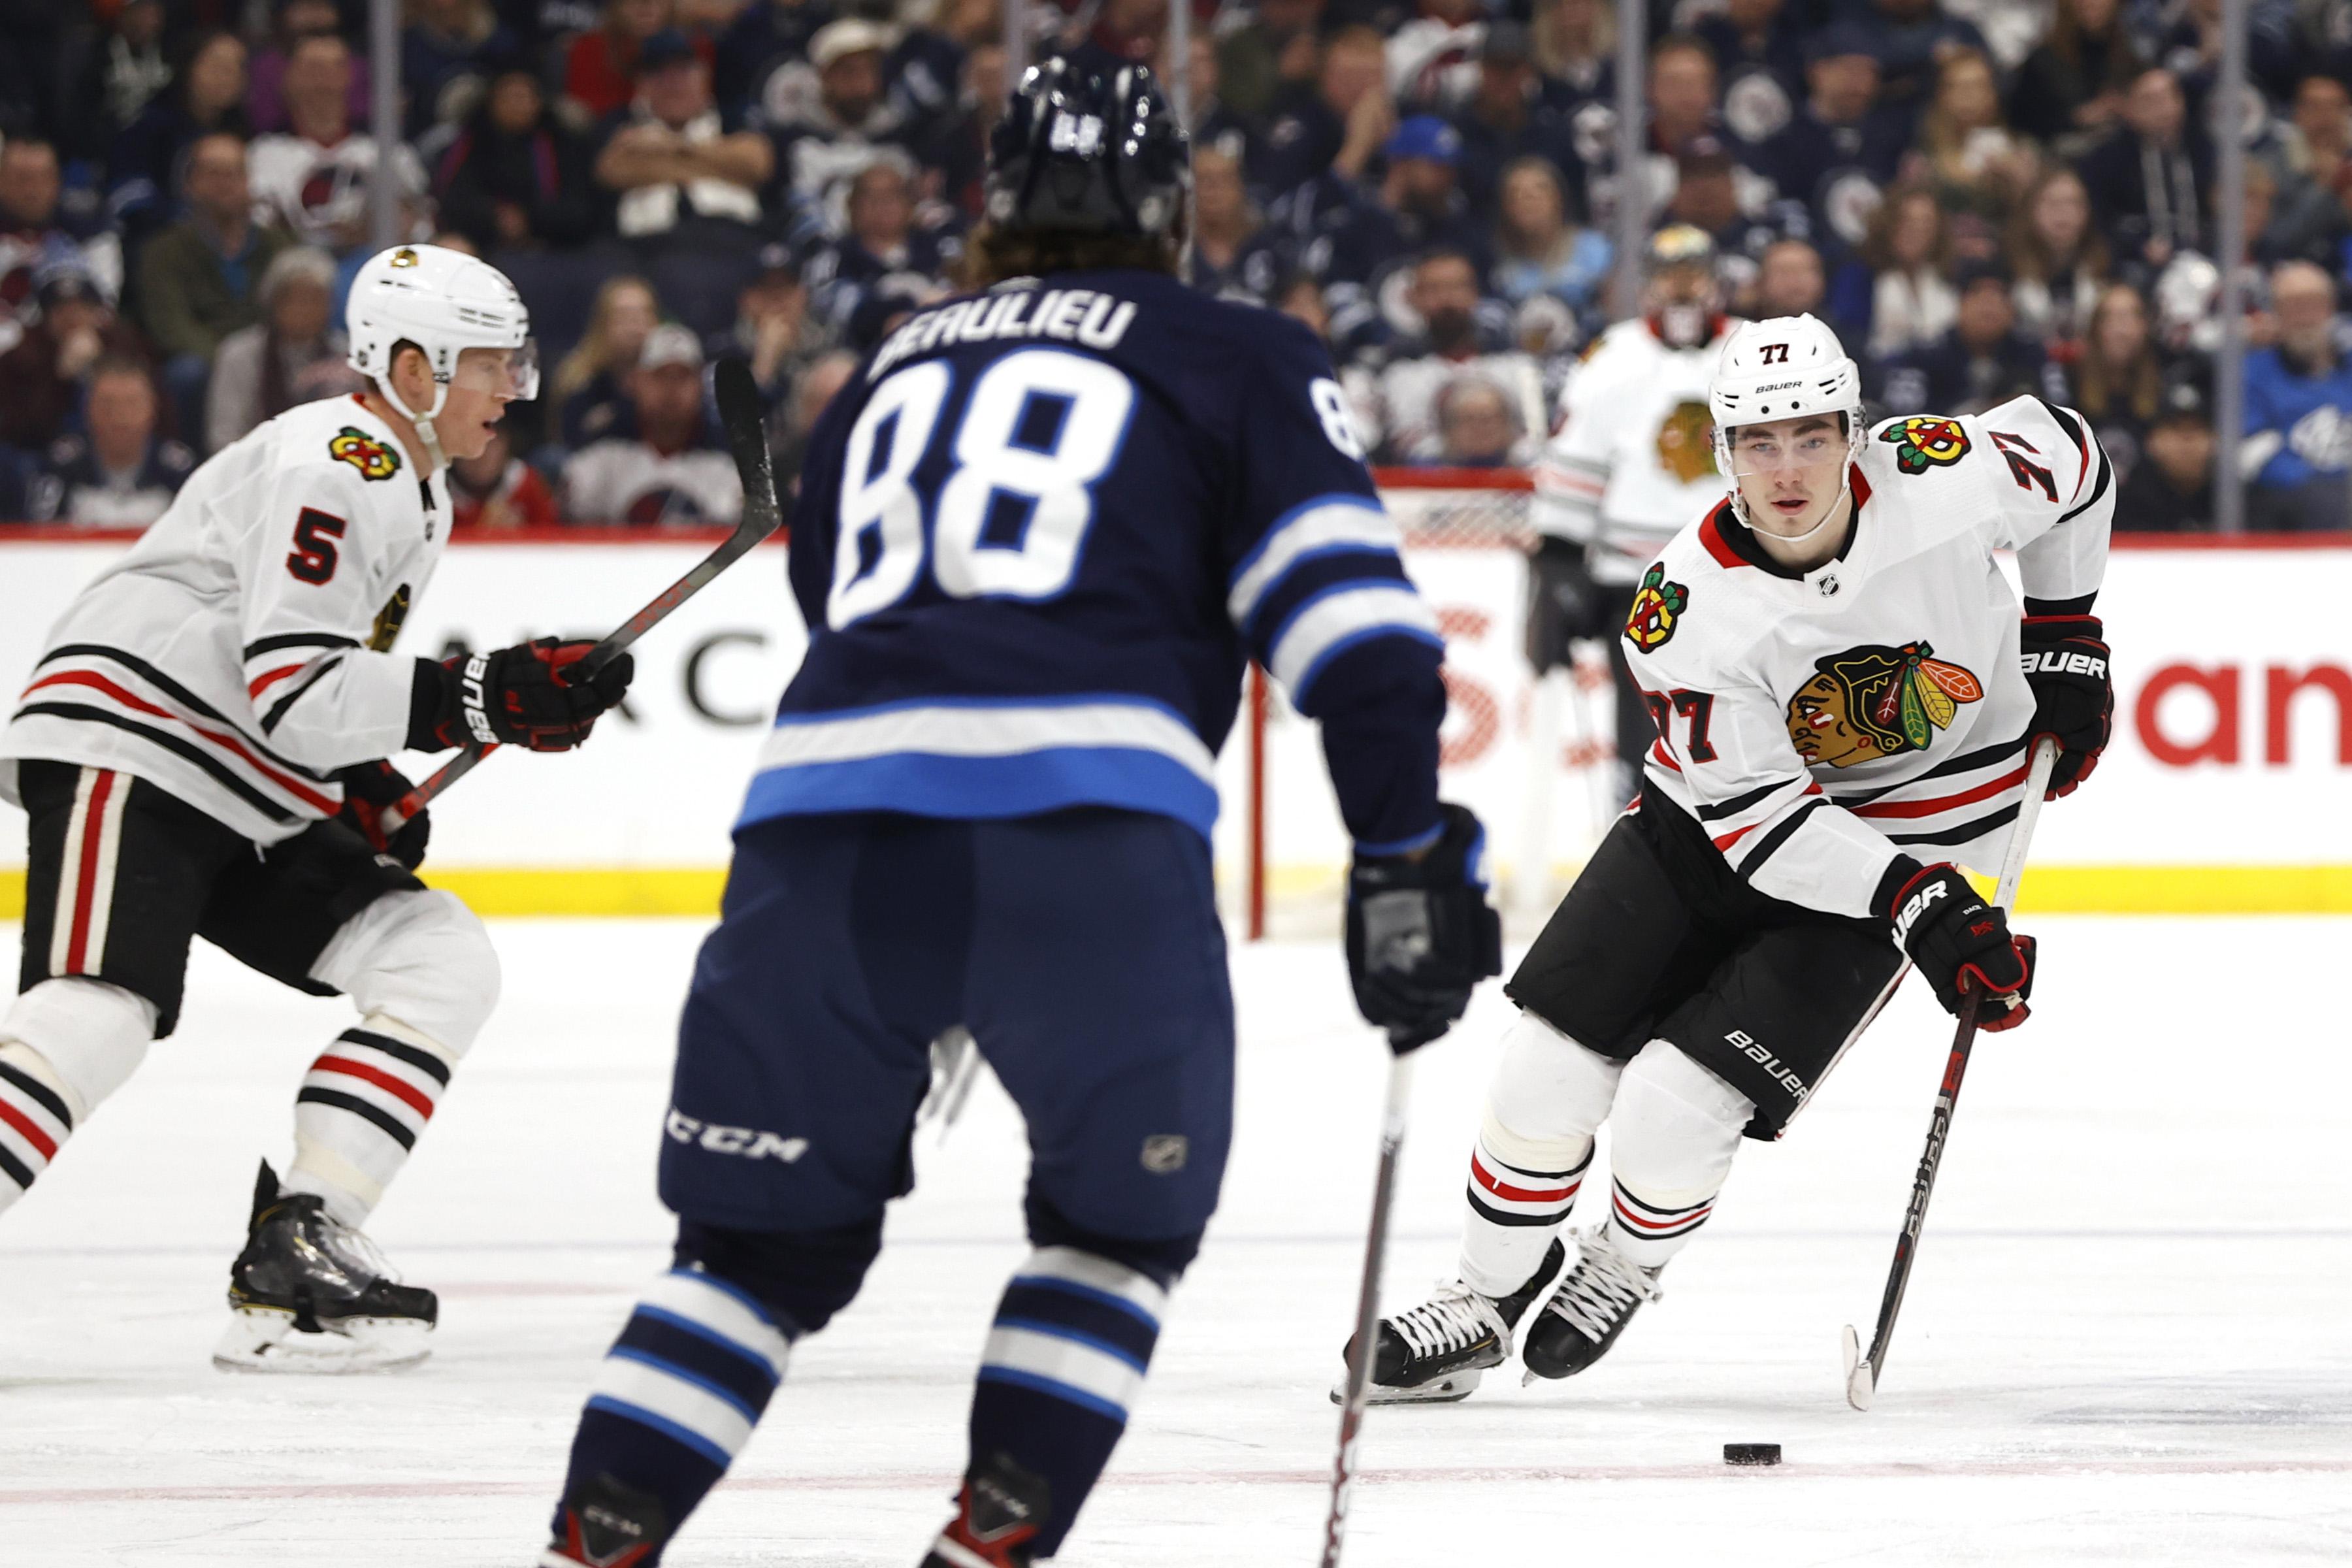 NHL: Chicago Blackhawks at Winnipeg Jets